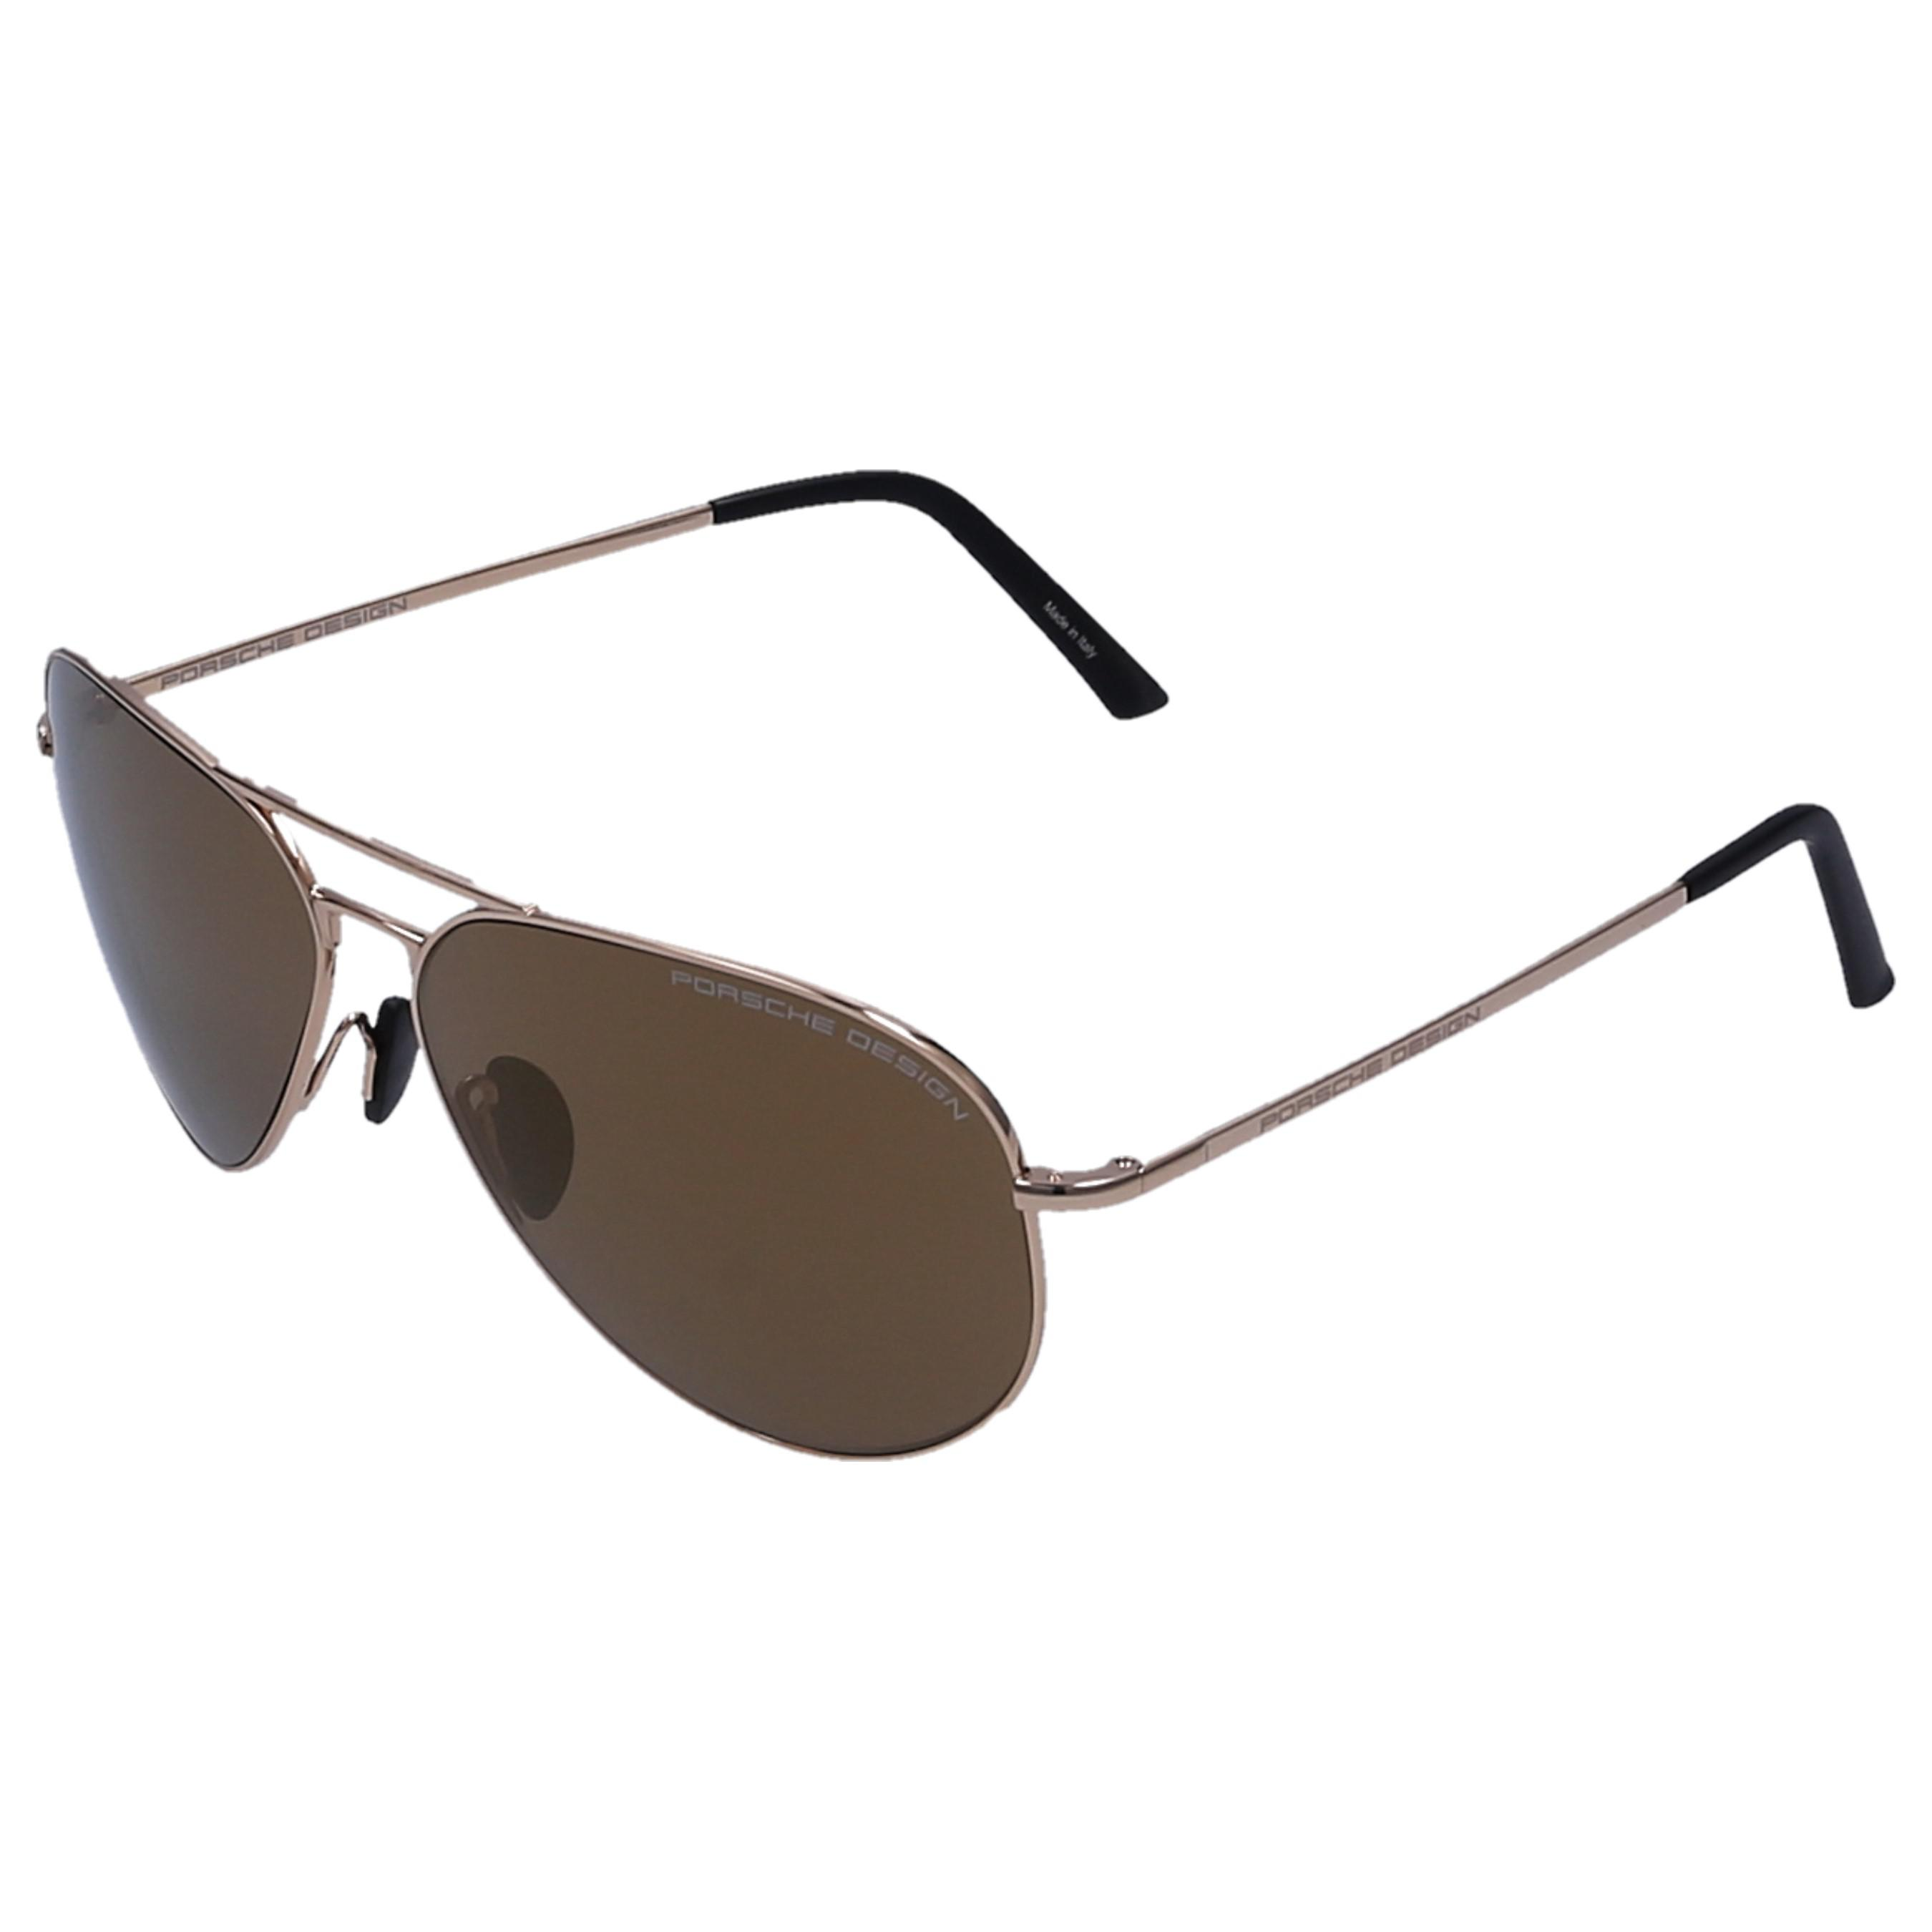 f84ab62c9d0 Porsche Design - Metallic Men Sunglasses Aviator 8508 Metal Gold for Men -  Lyst. View fullscreen